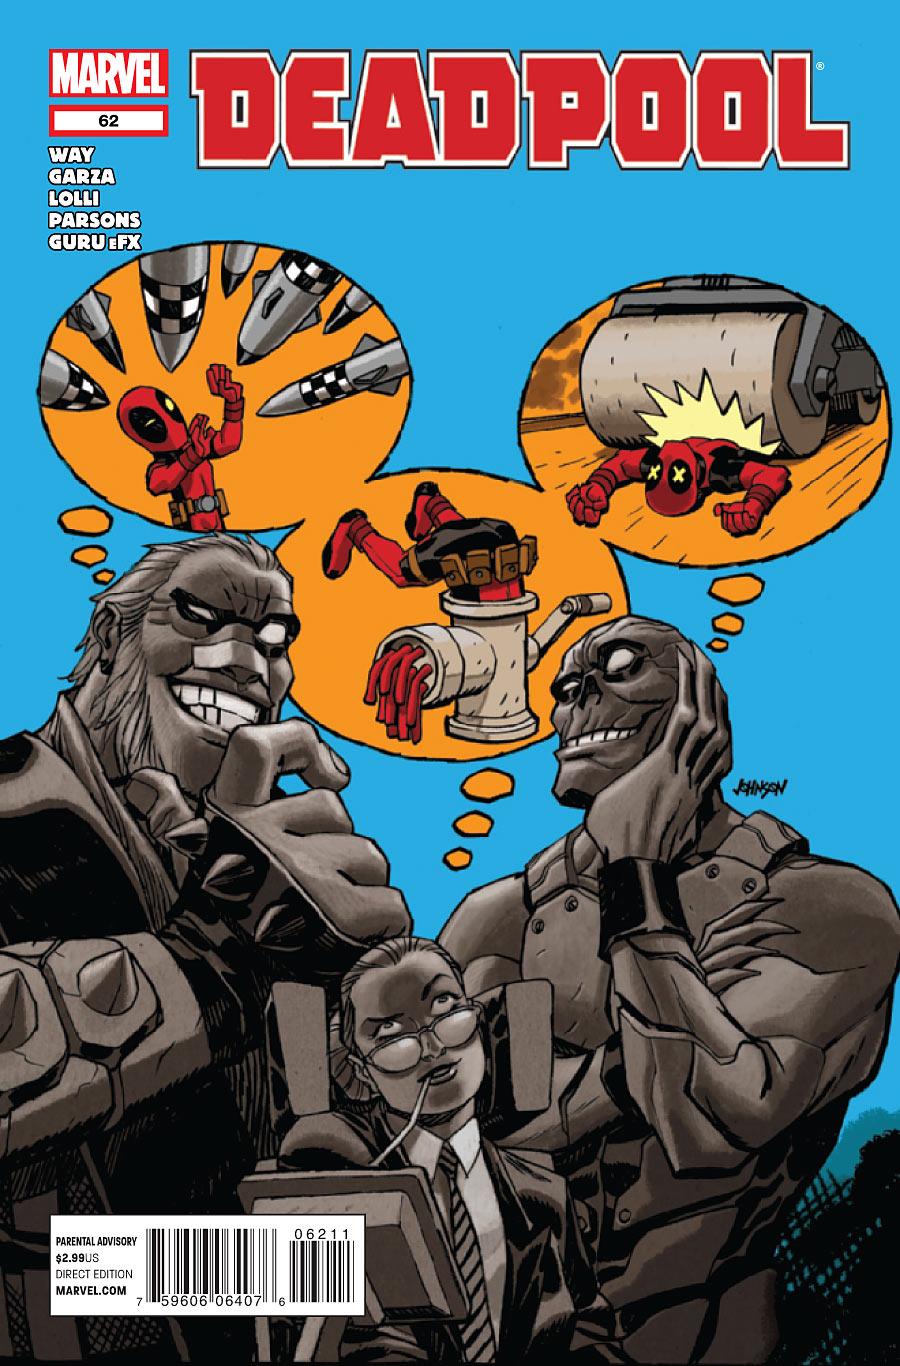 Deadpool #62